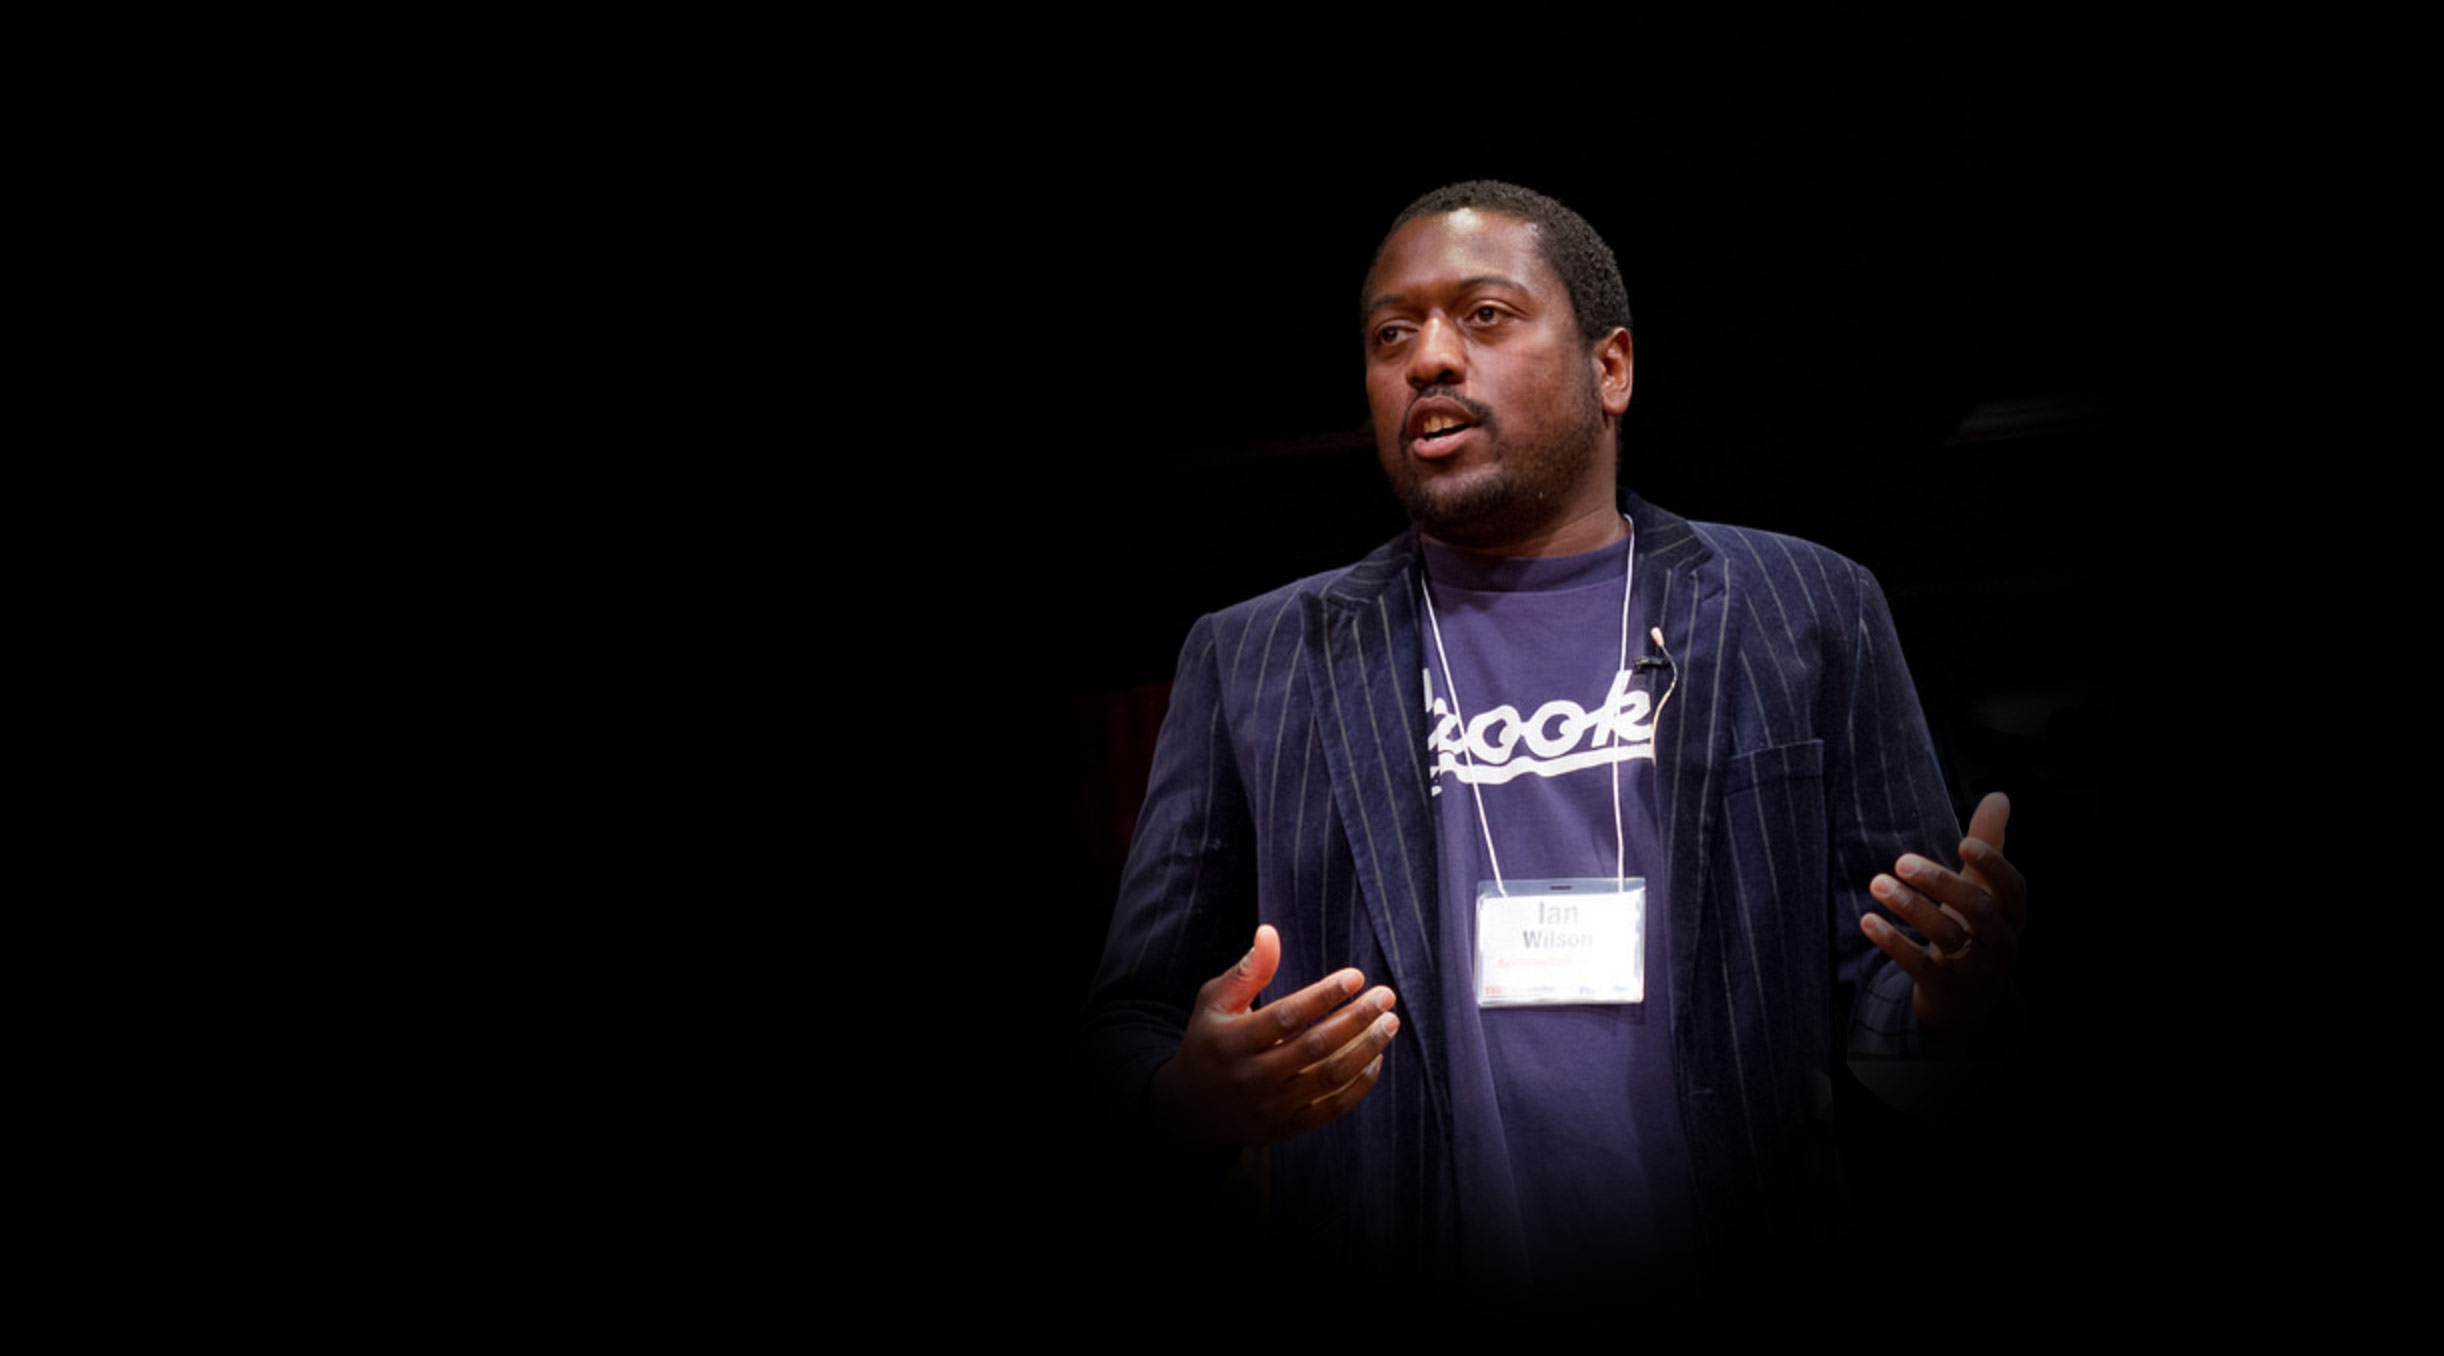 Ted Talk dating algoritm